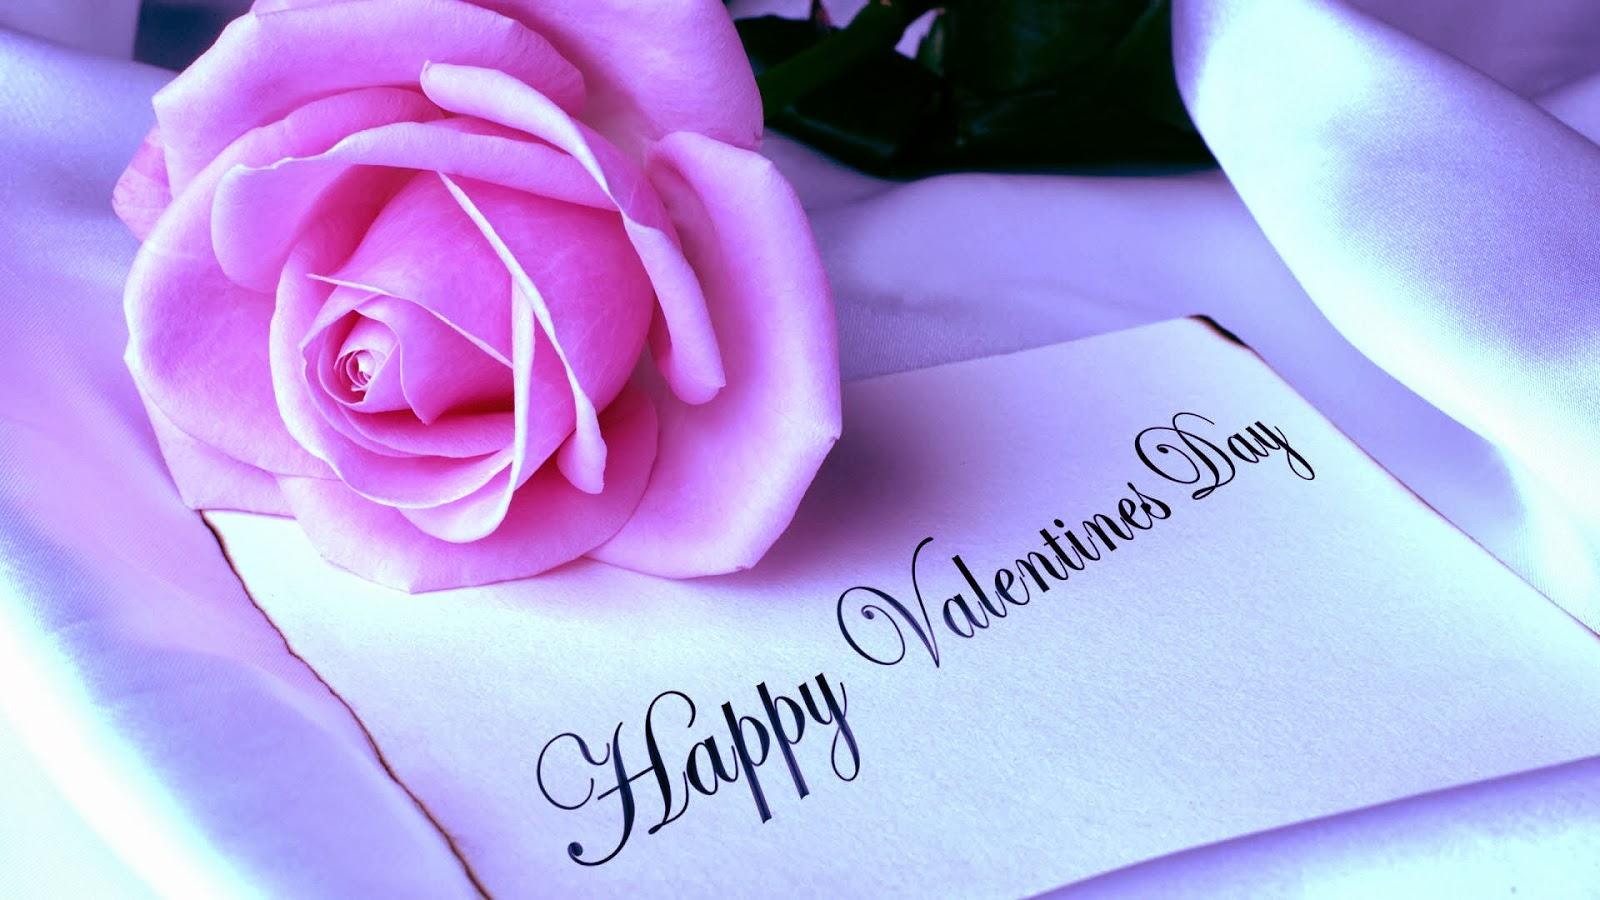 Valentine Day Special Wallpaper Free Download Funmazalive Com